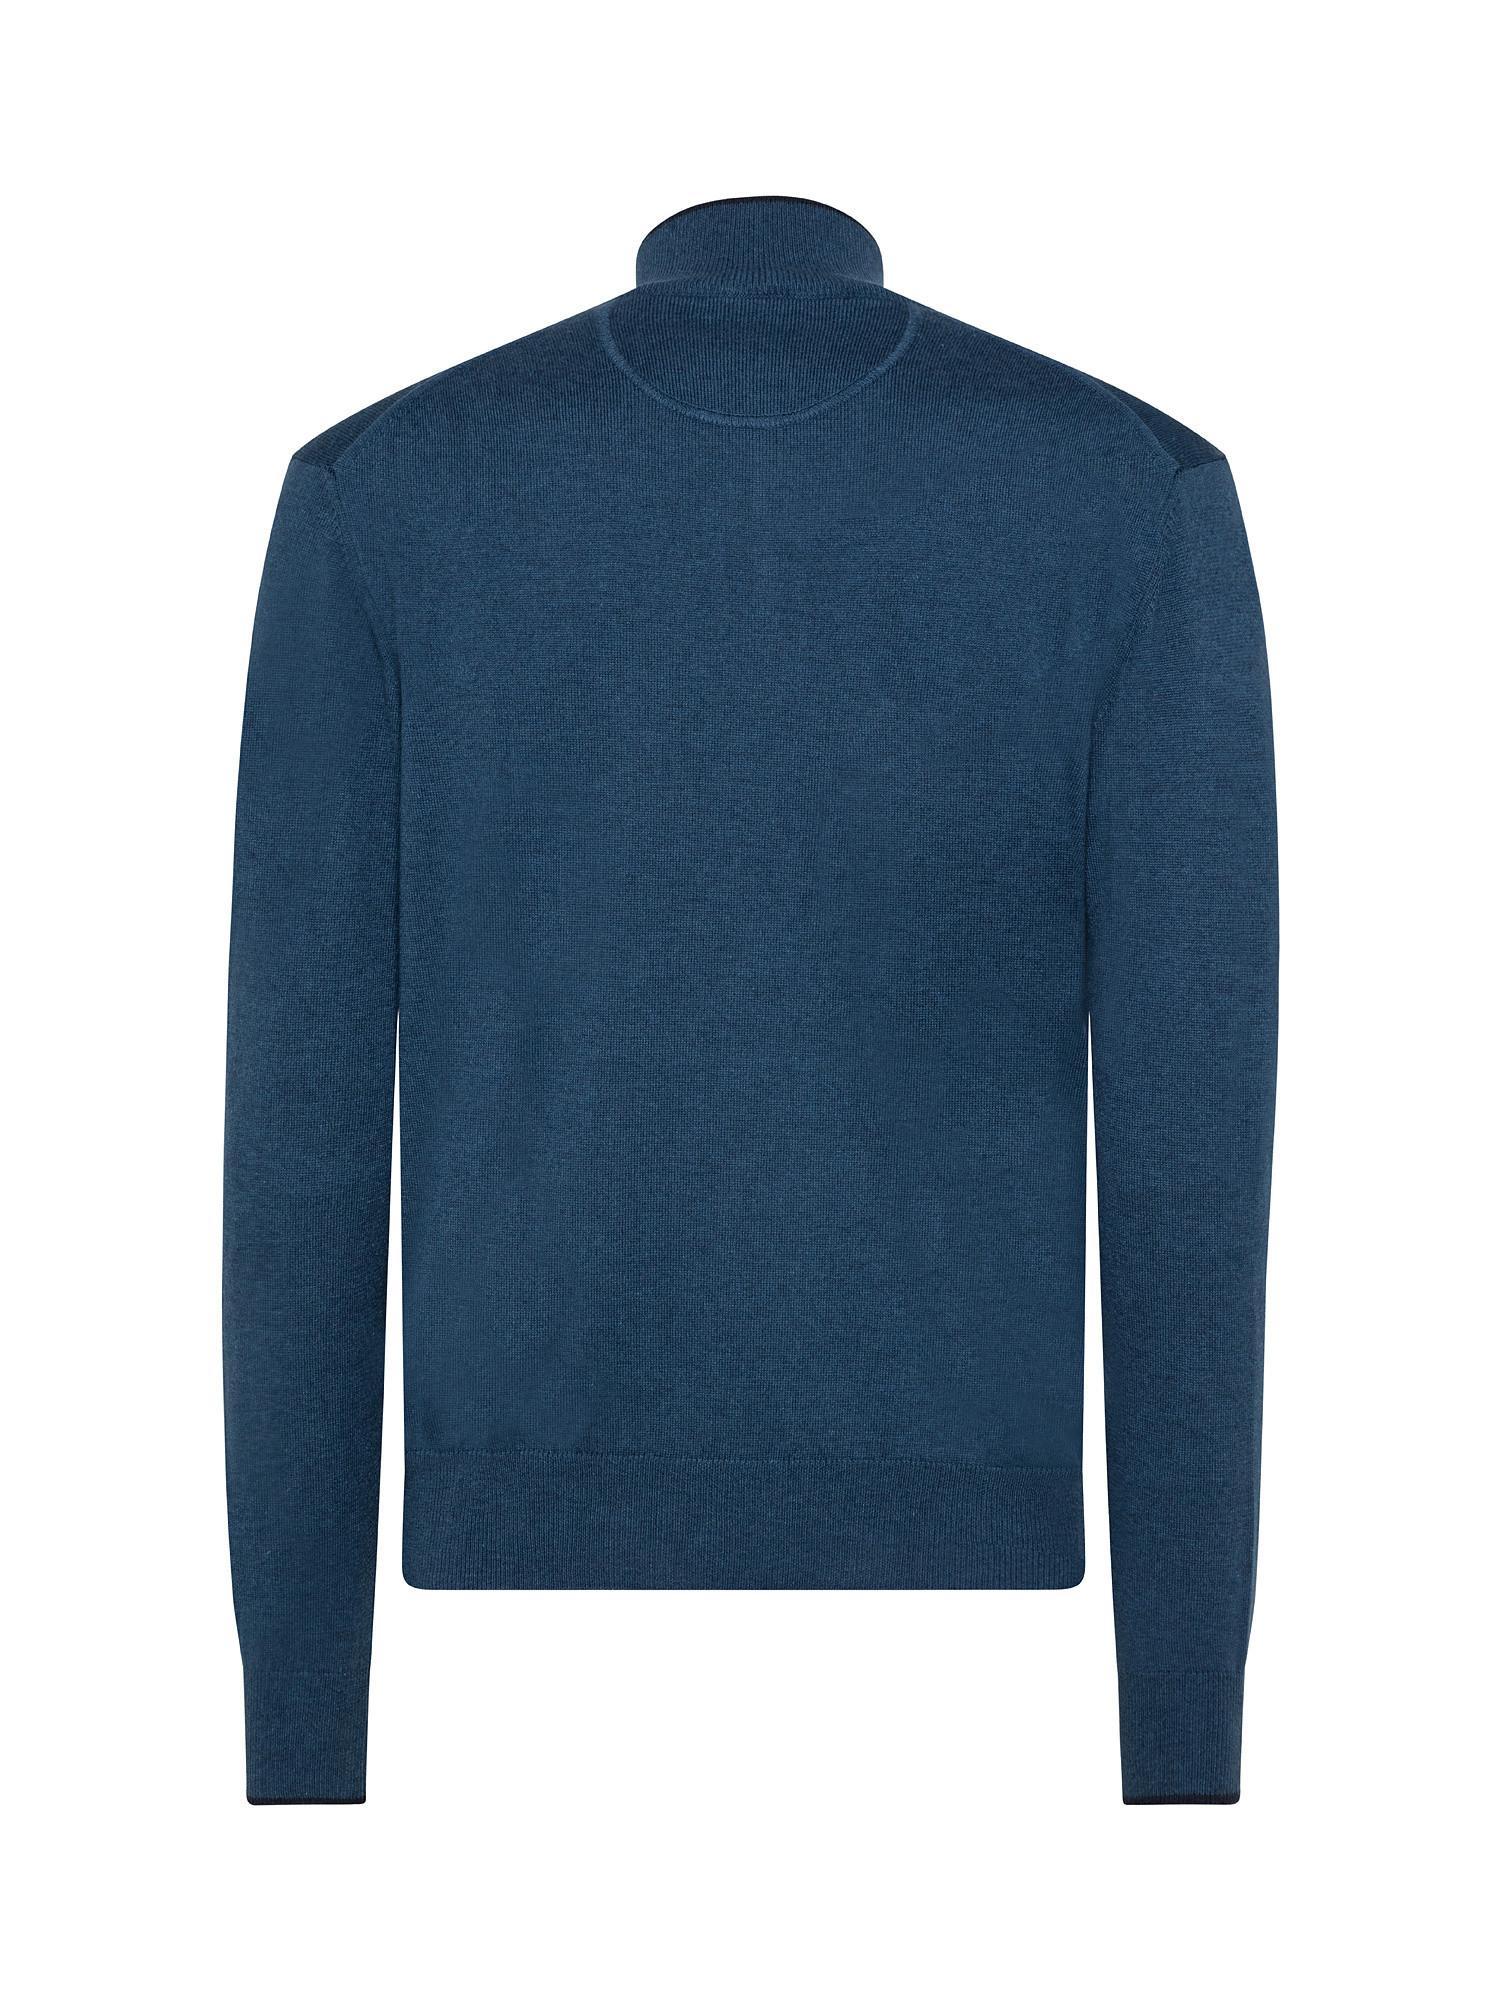 Maglia uomo a maniche lunghe in cotone misto lana, Blu, large image number 1